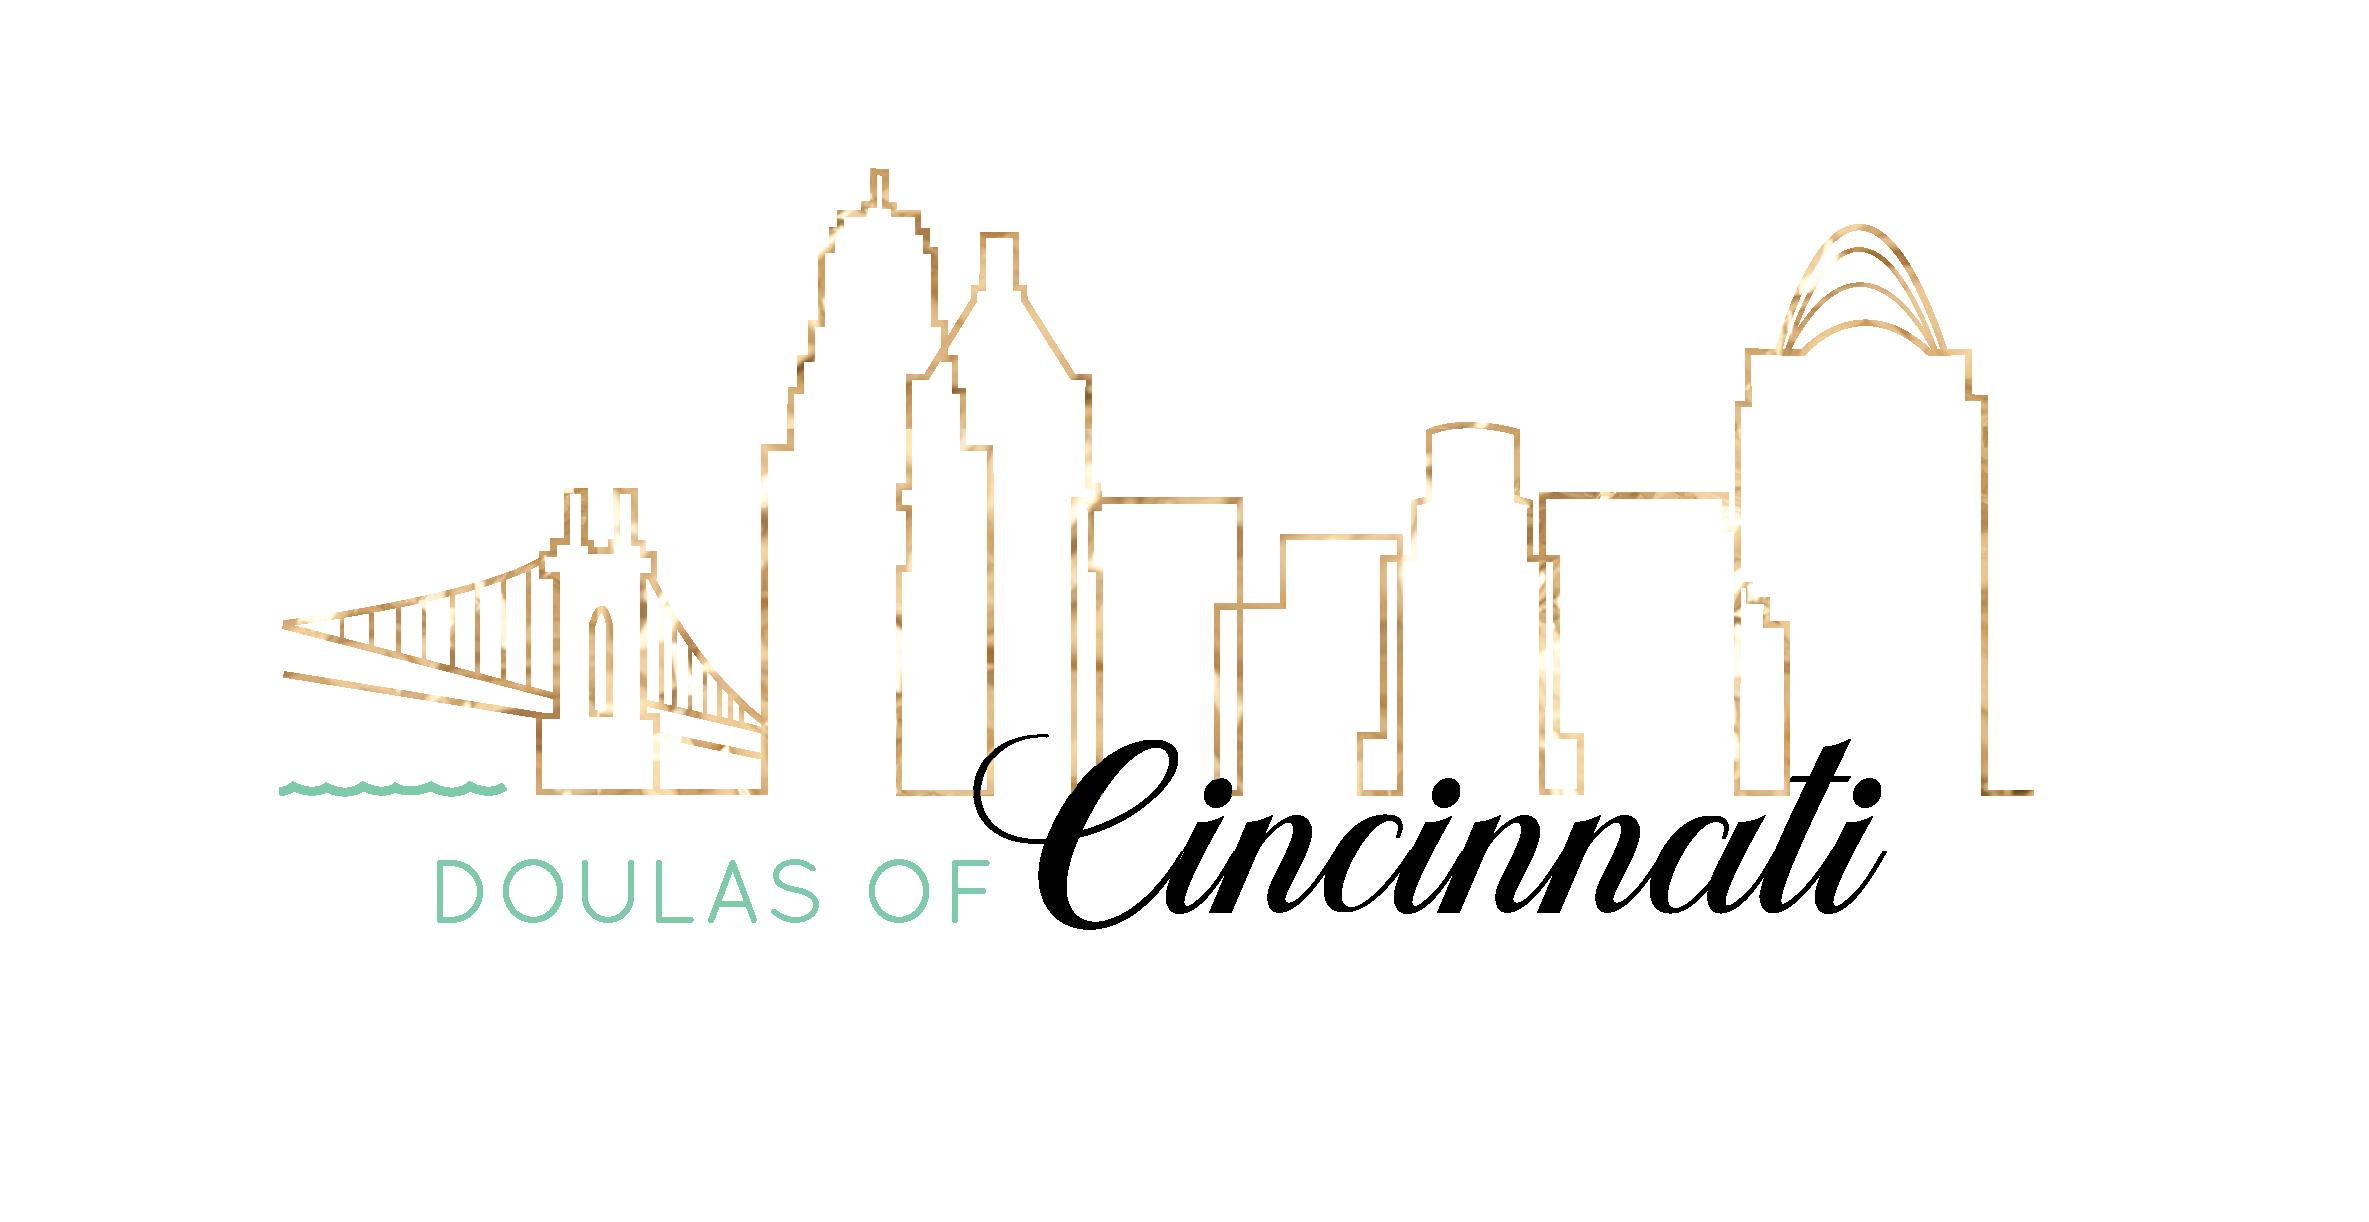 Doulas of Cincinnati - Birth and Postpartum Doulas